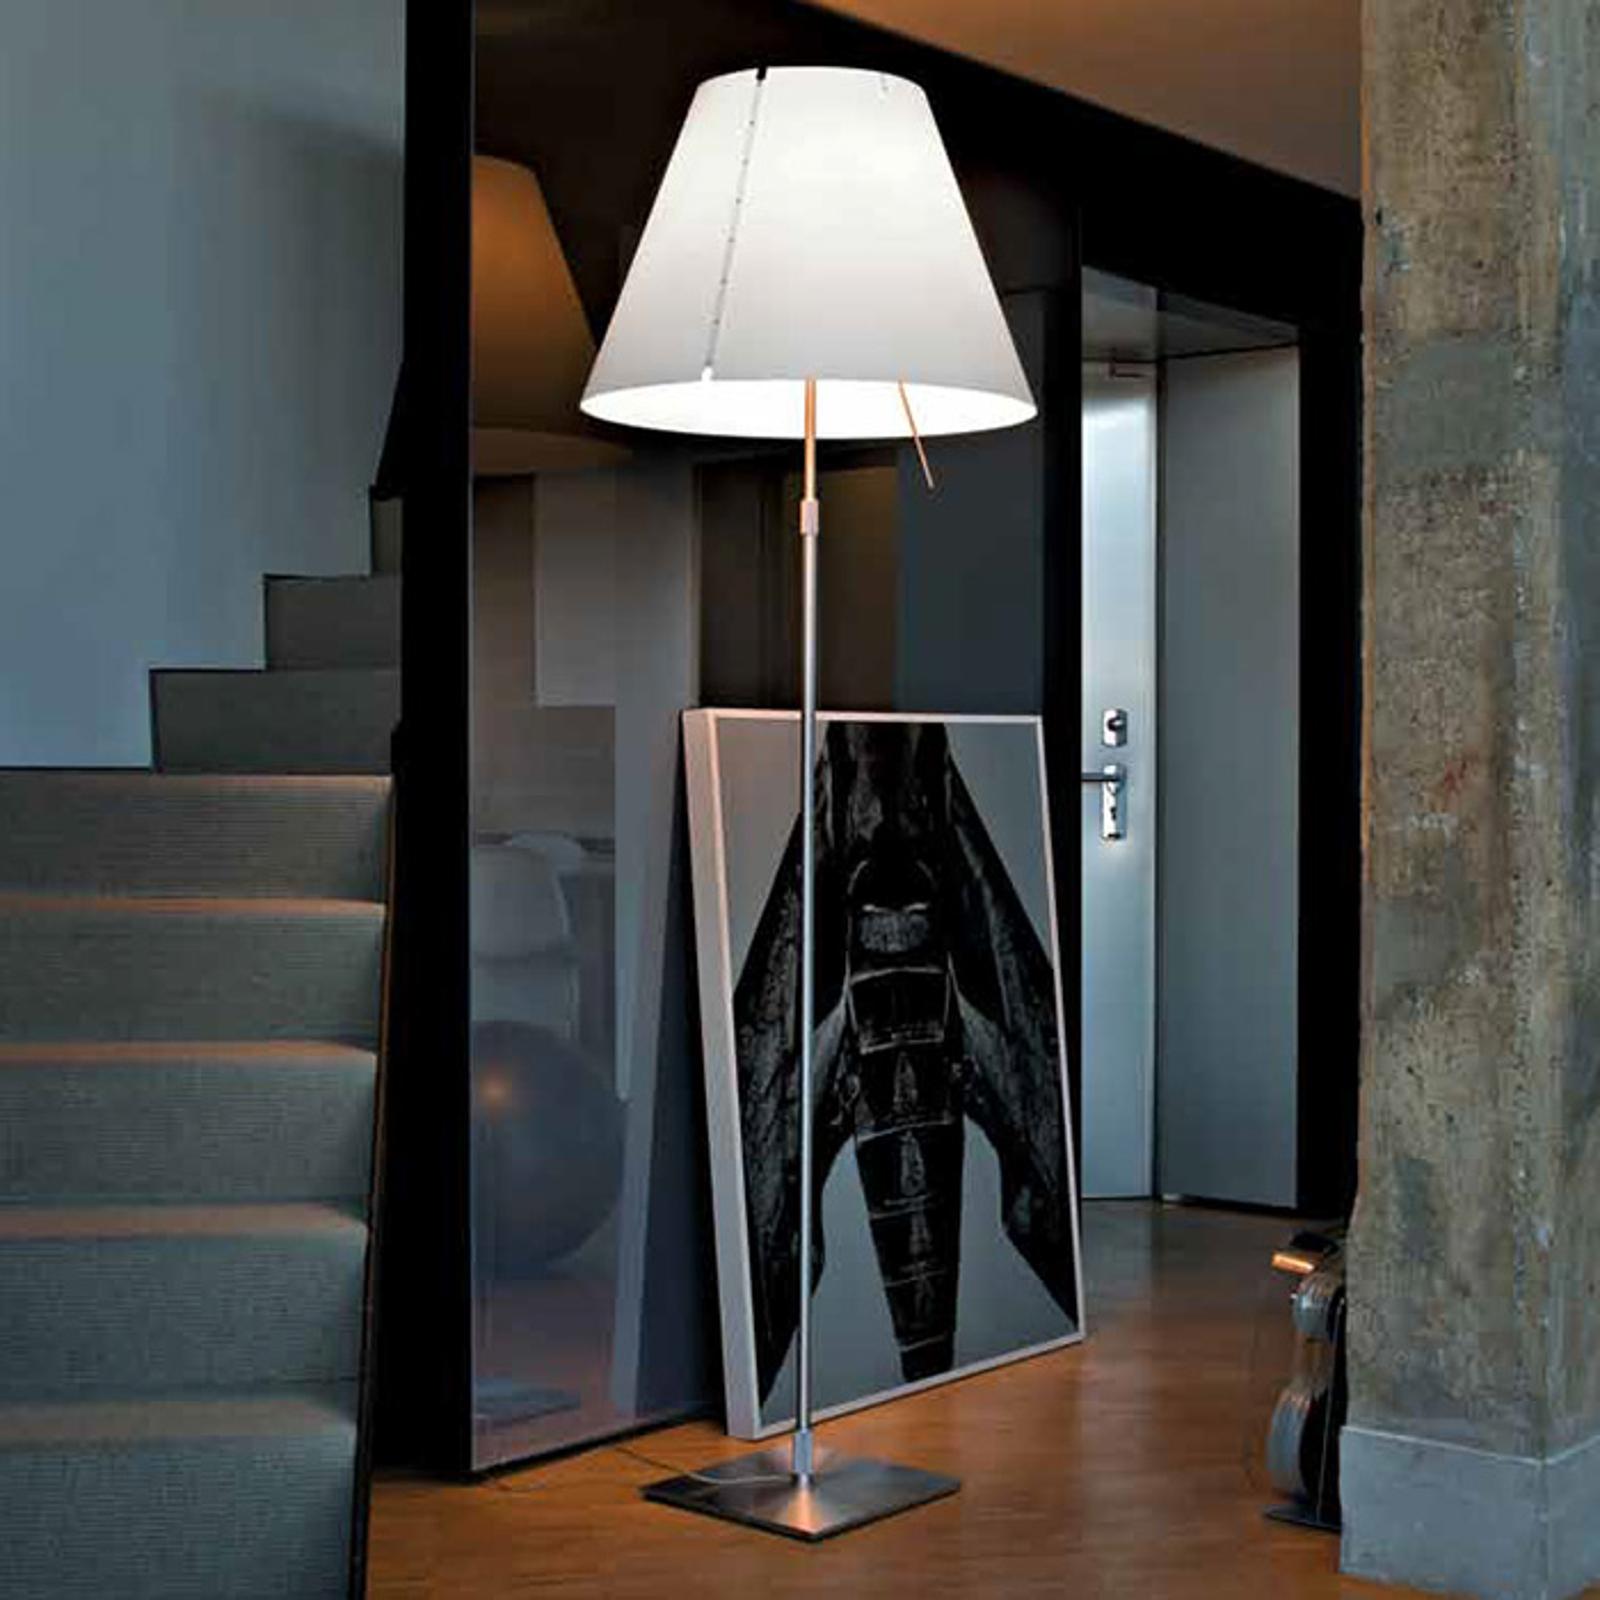 Duża lampa stojąca Grande Costanza